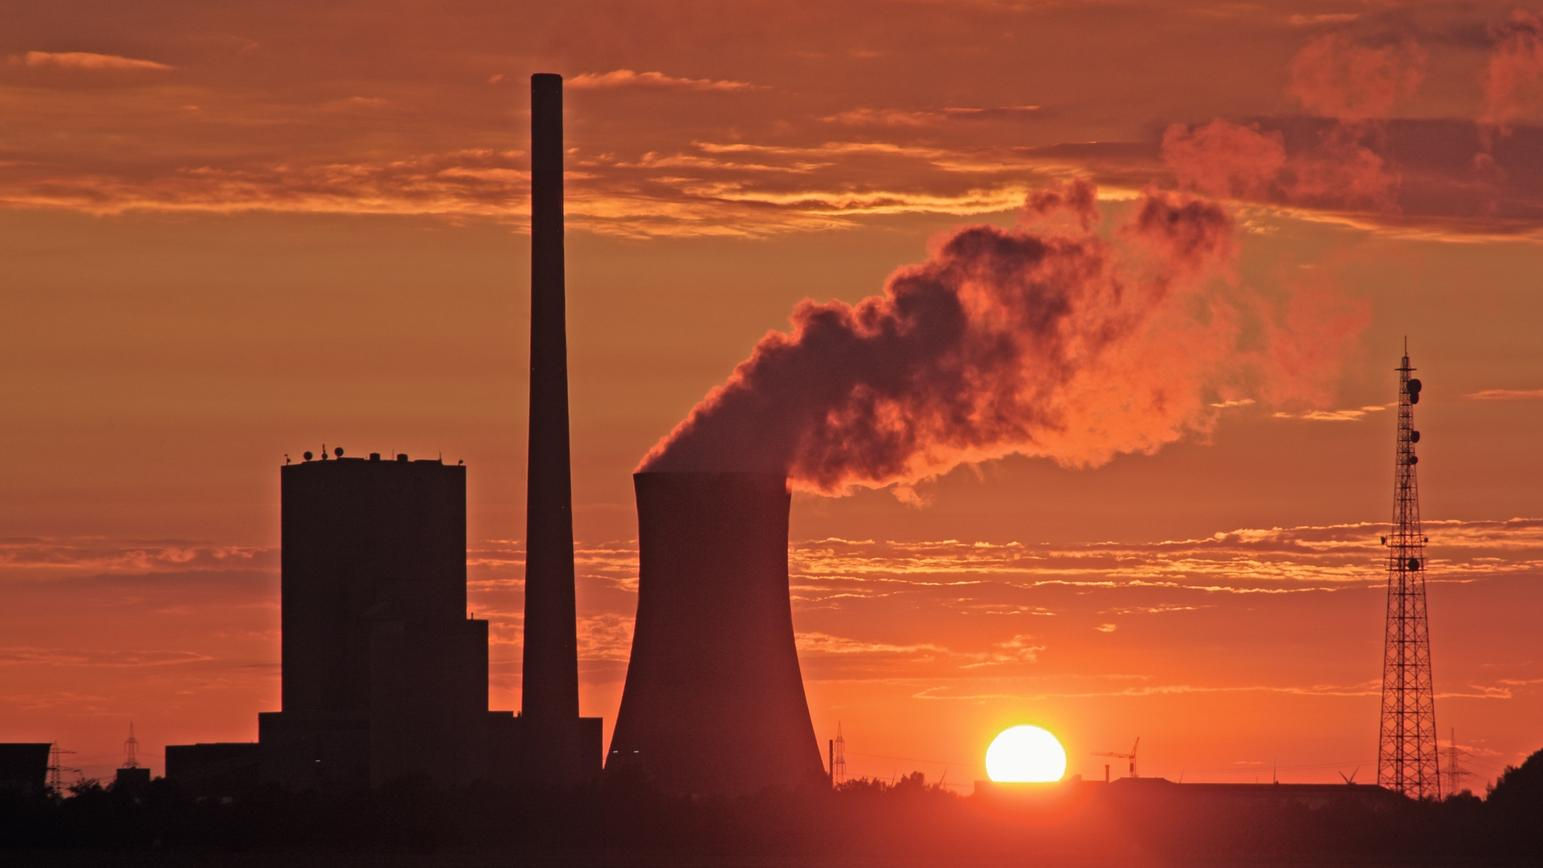 Kohlekraftwerk vor Sonnenuntergang.